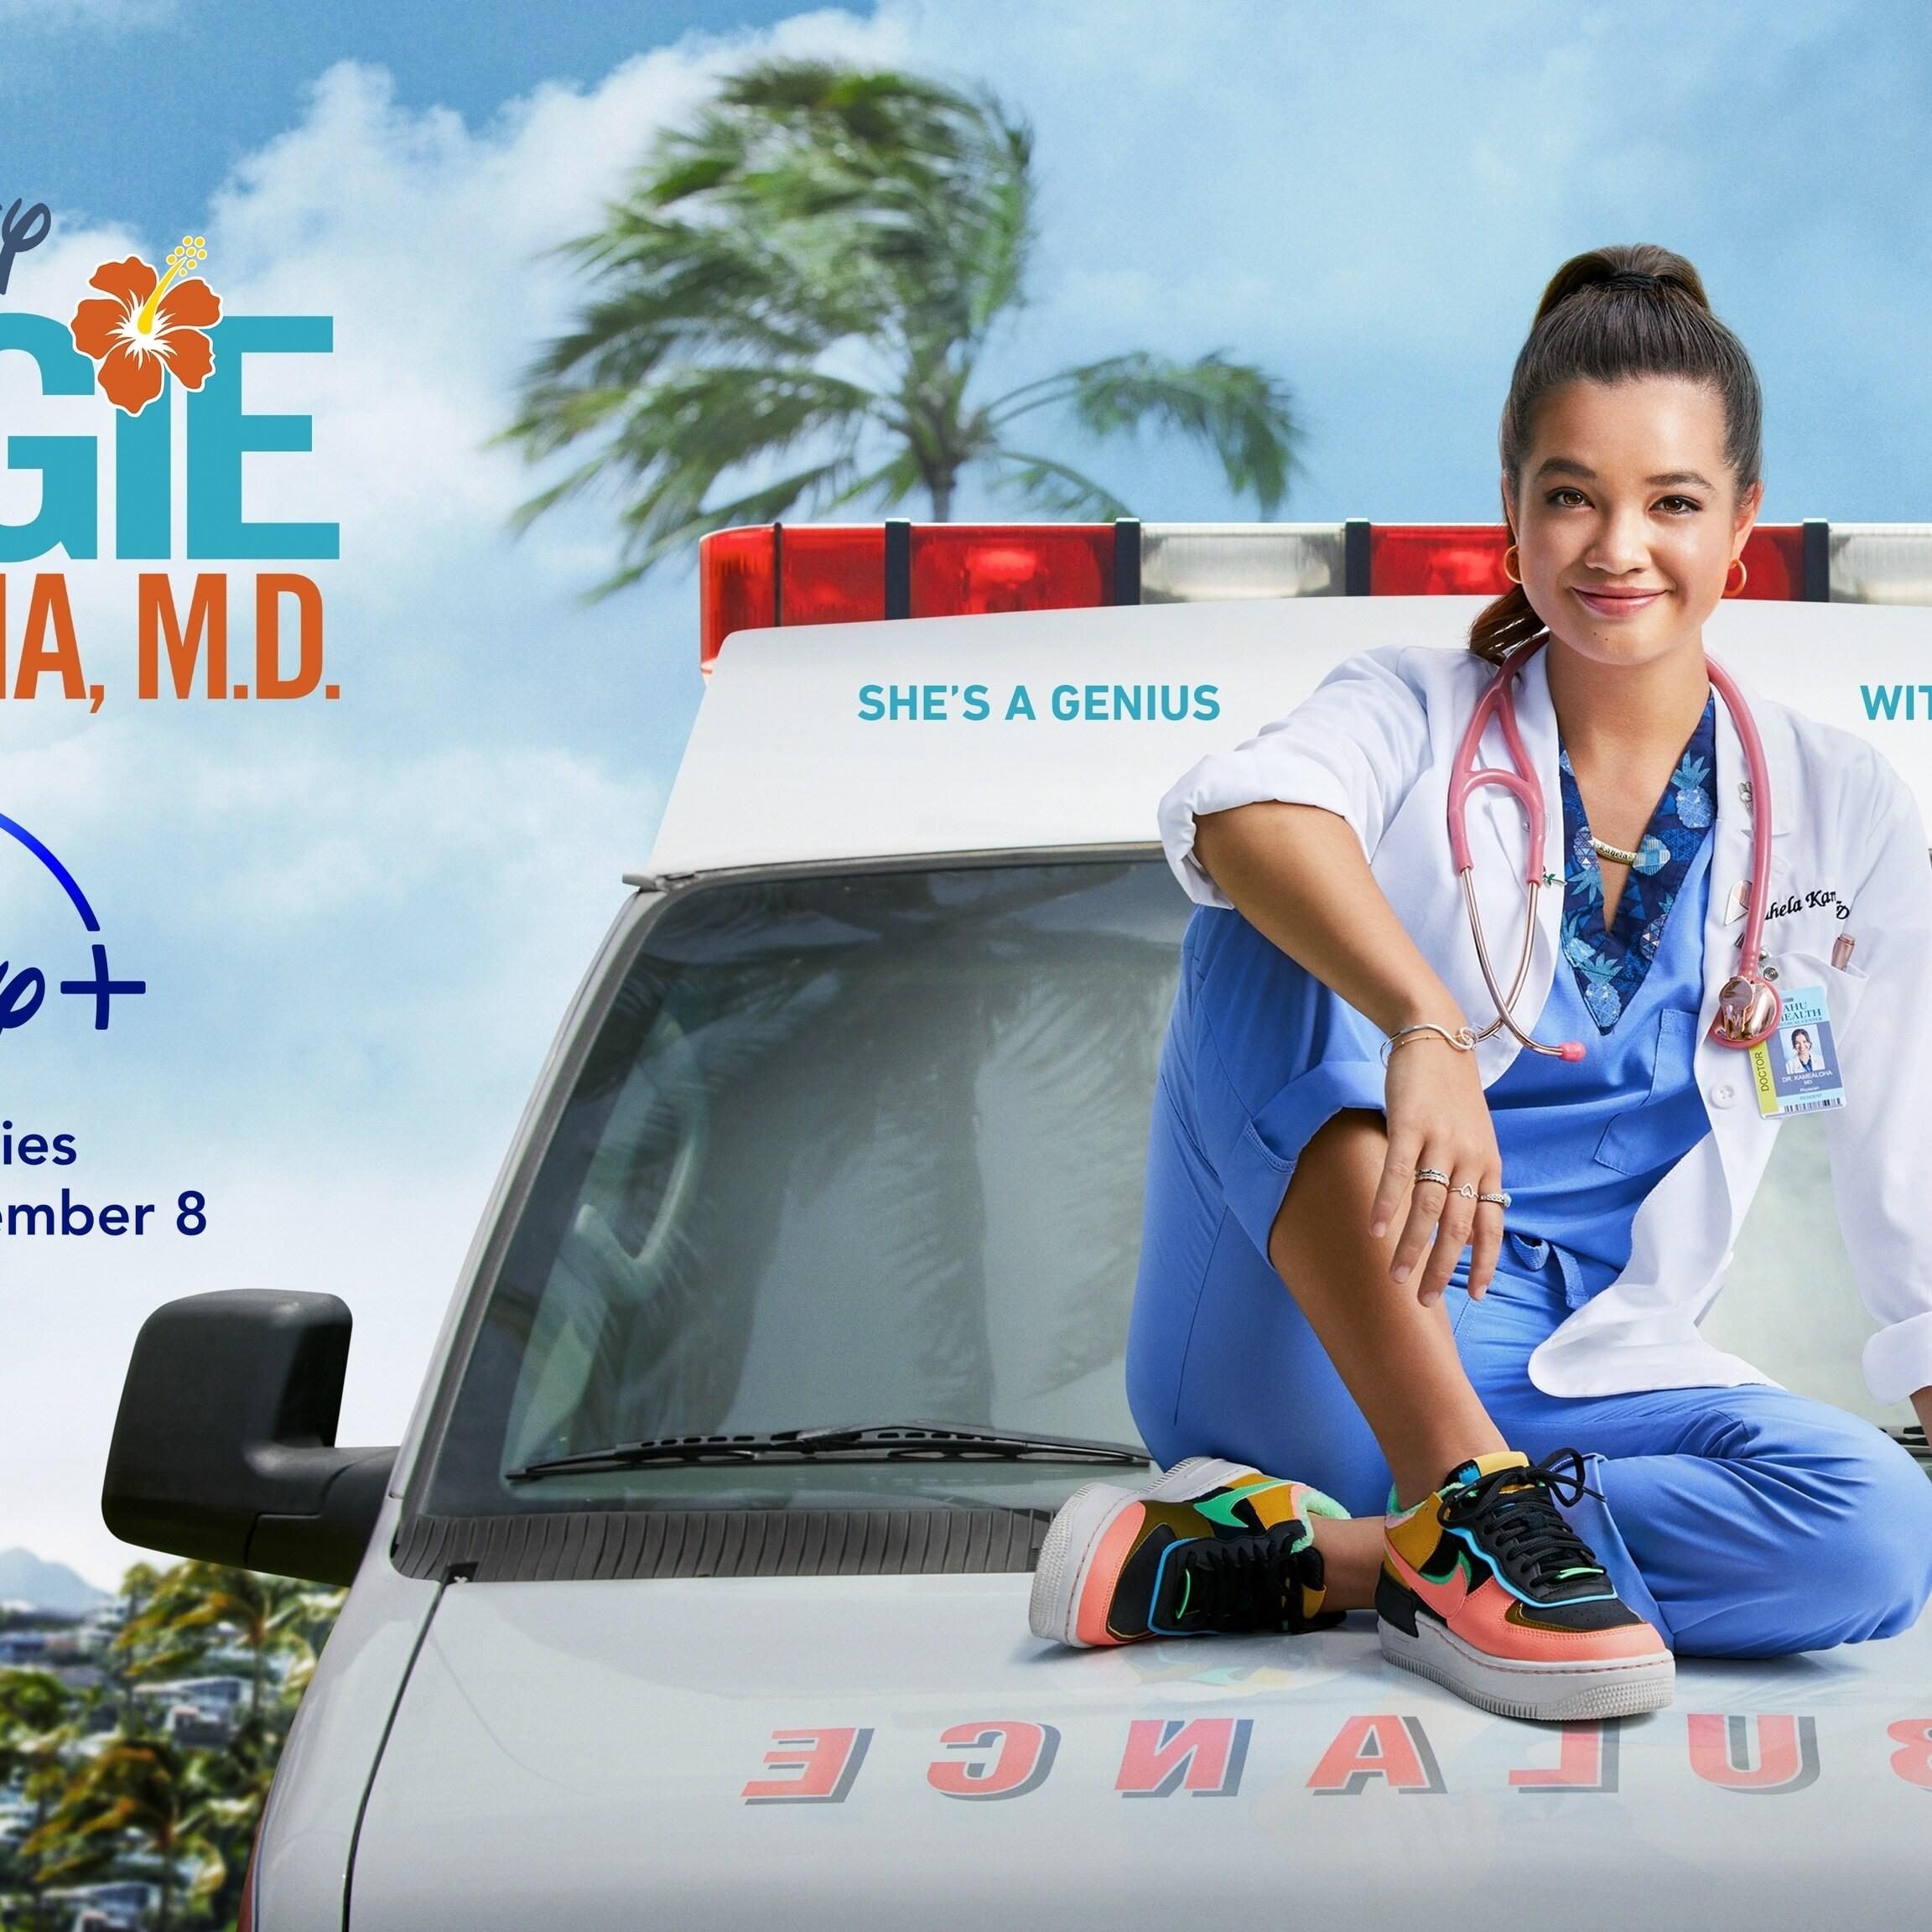 'Doogie Kamealoha, M.D.' Starts Streaming September 8 Exclusively On Disney+